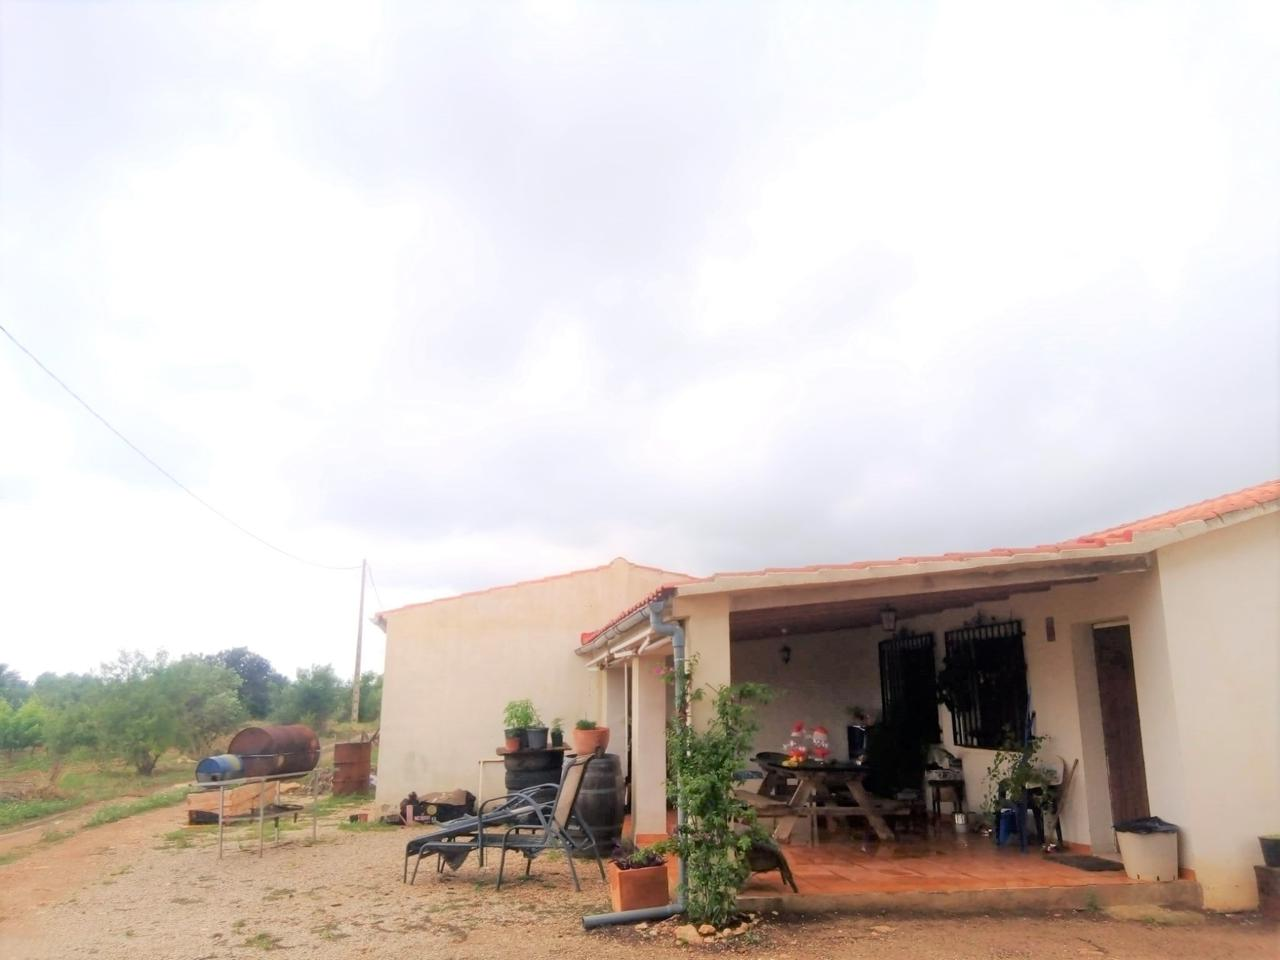 Casa  Calle baiona. Masia de una planta situada en partida baiona en alió, terreno d